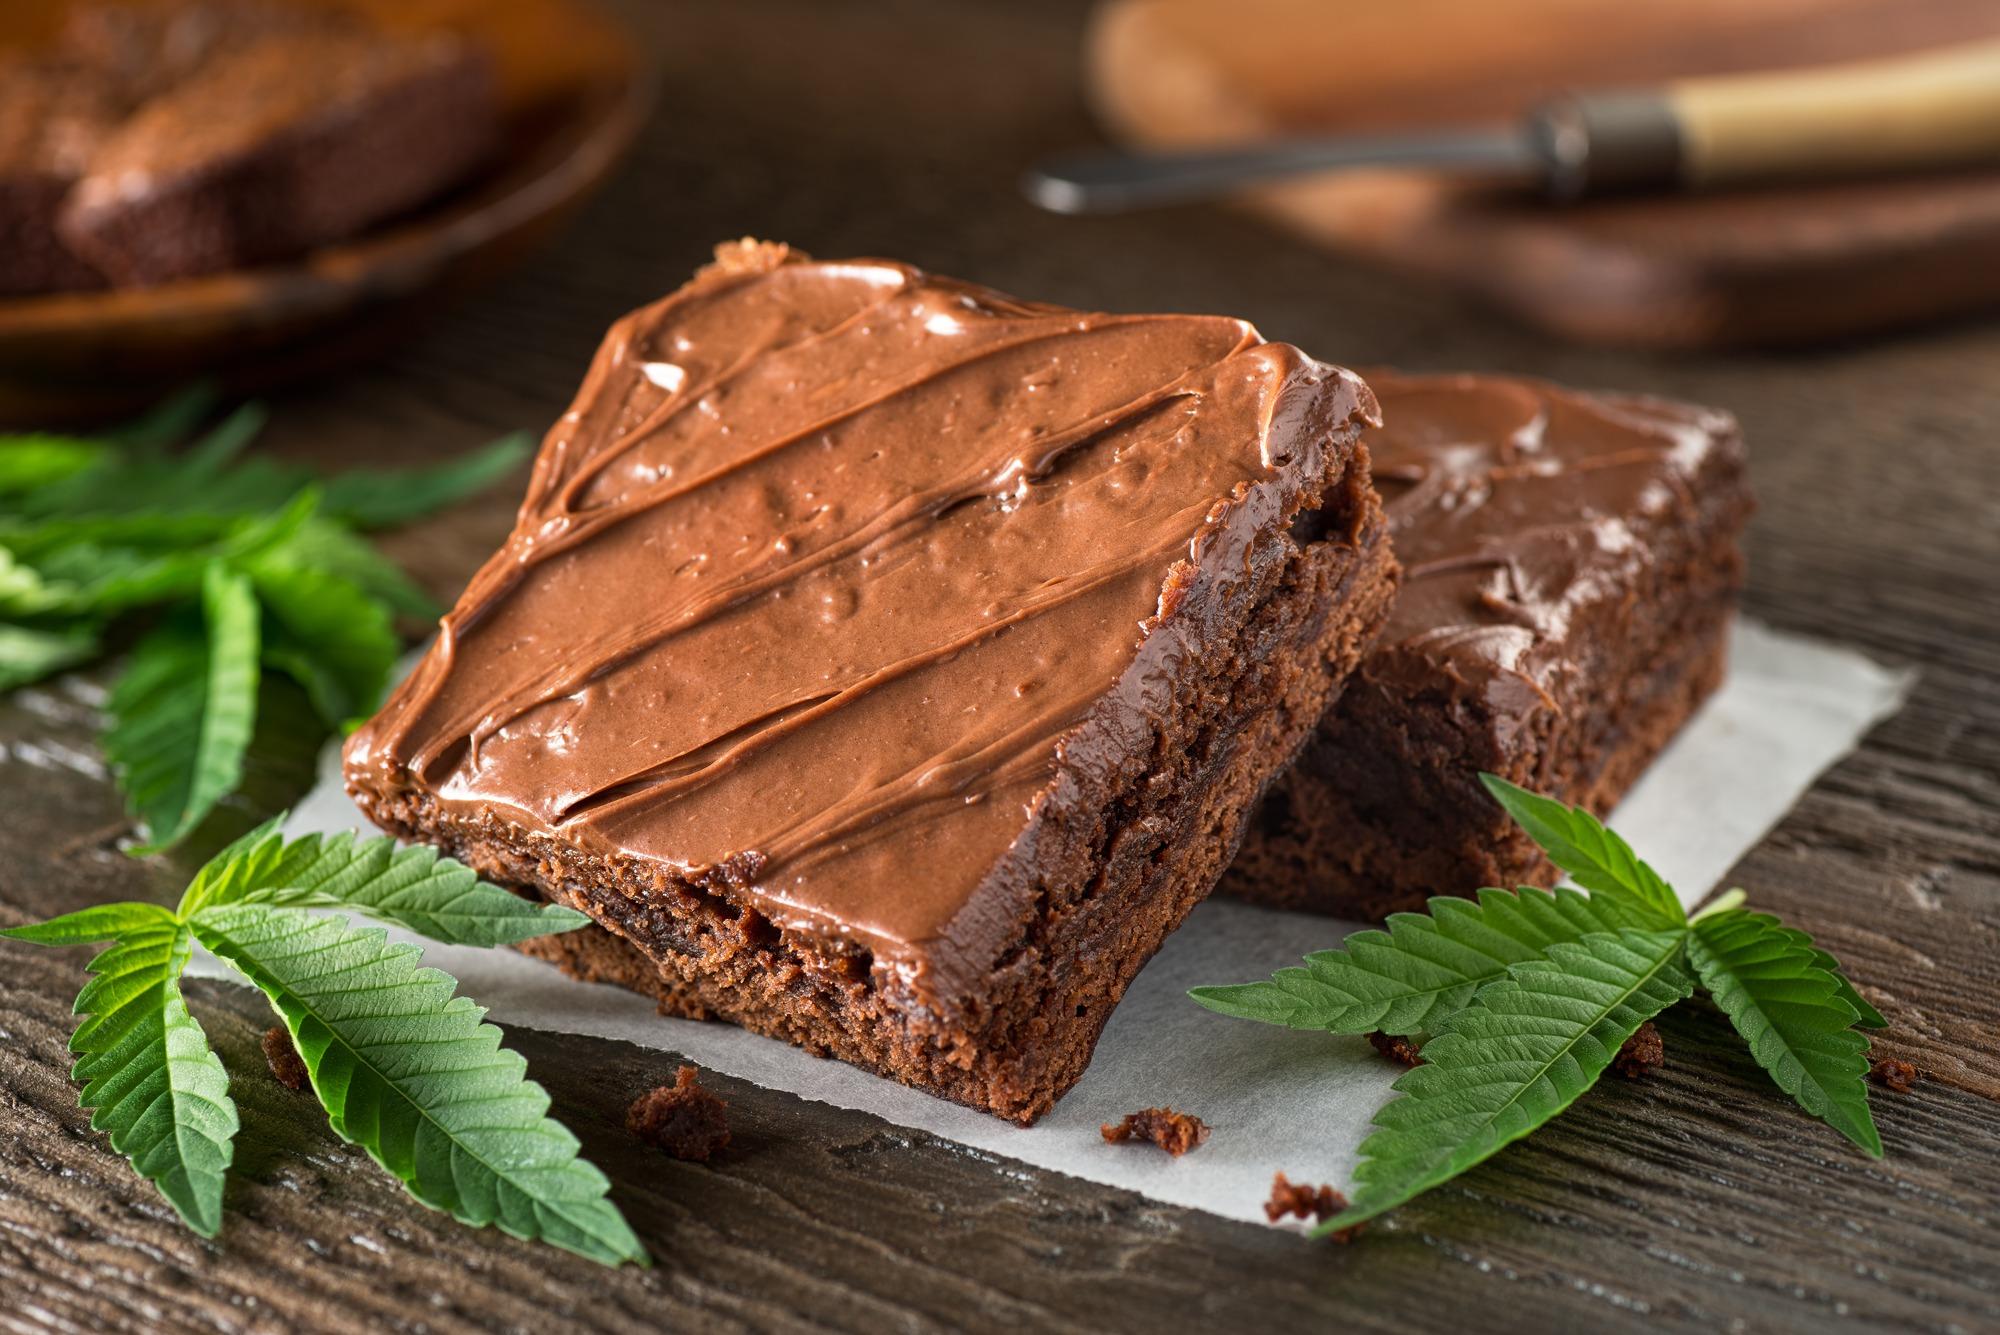 marijuana edibles givingtreedispensary.com